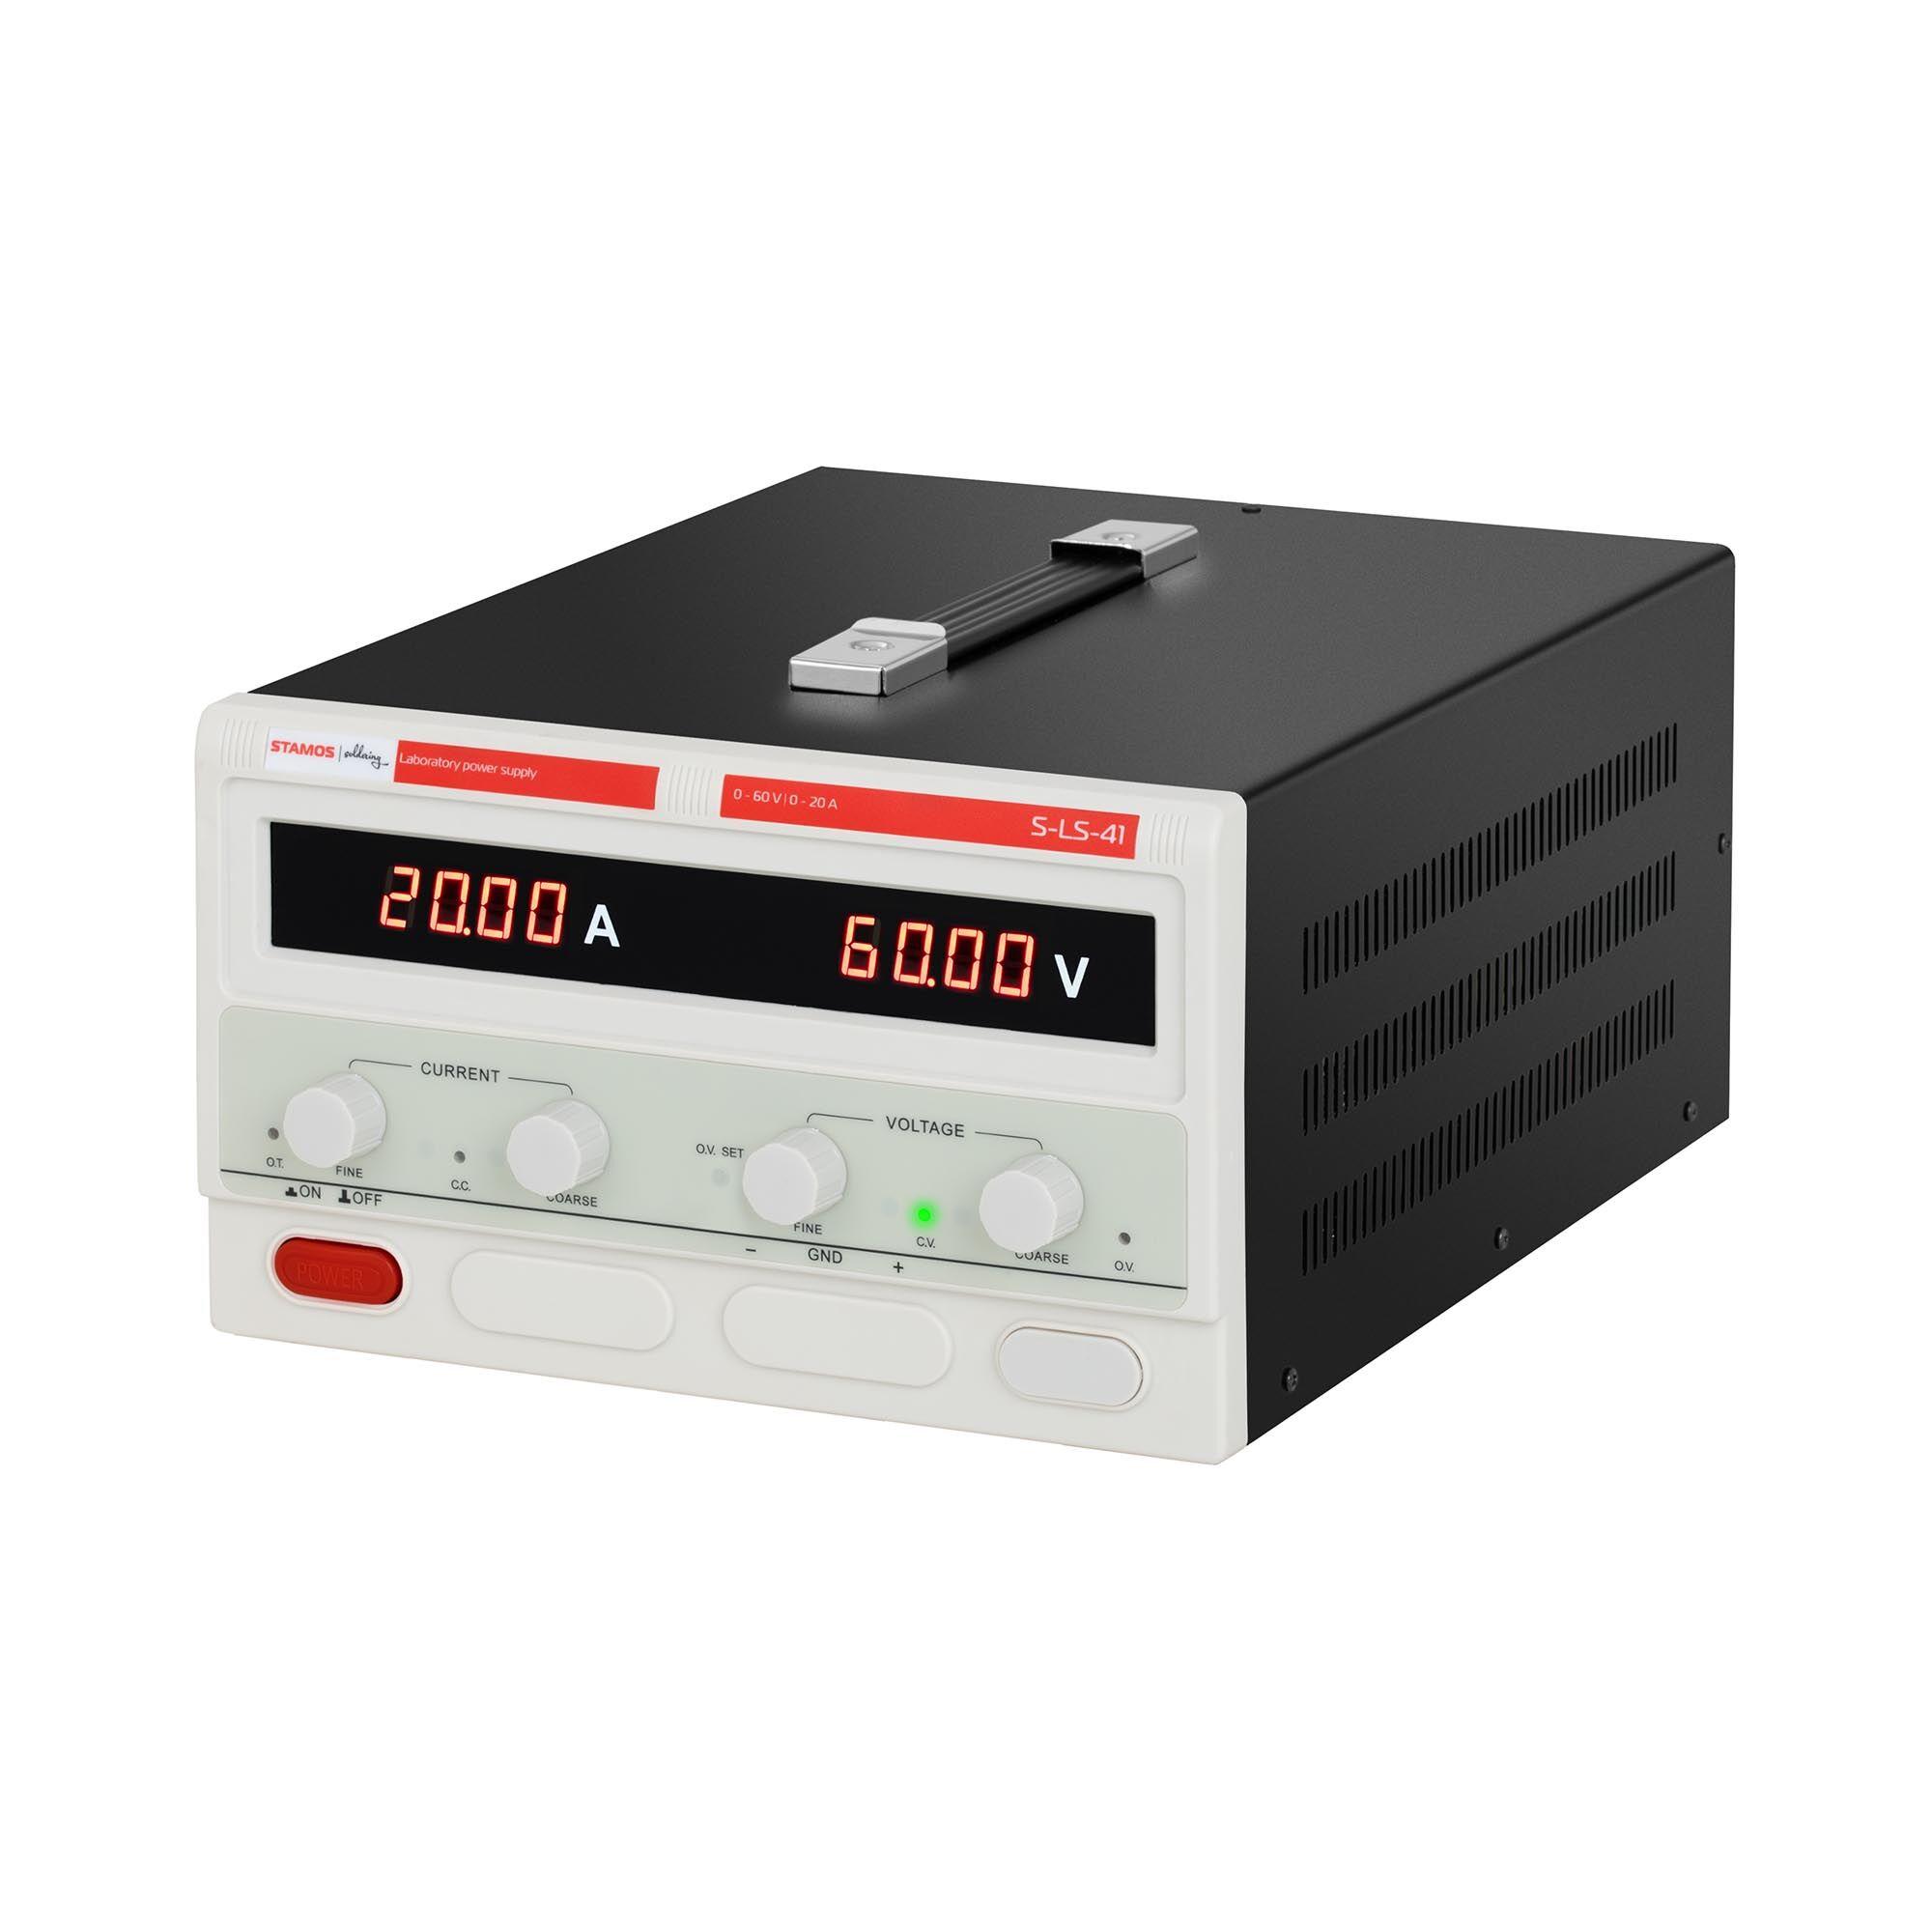 Stamos Soldering Laboratory Power Supply - 0-60 V - 0-20 A DC - 1,200 W S-LS-41